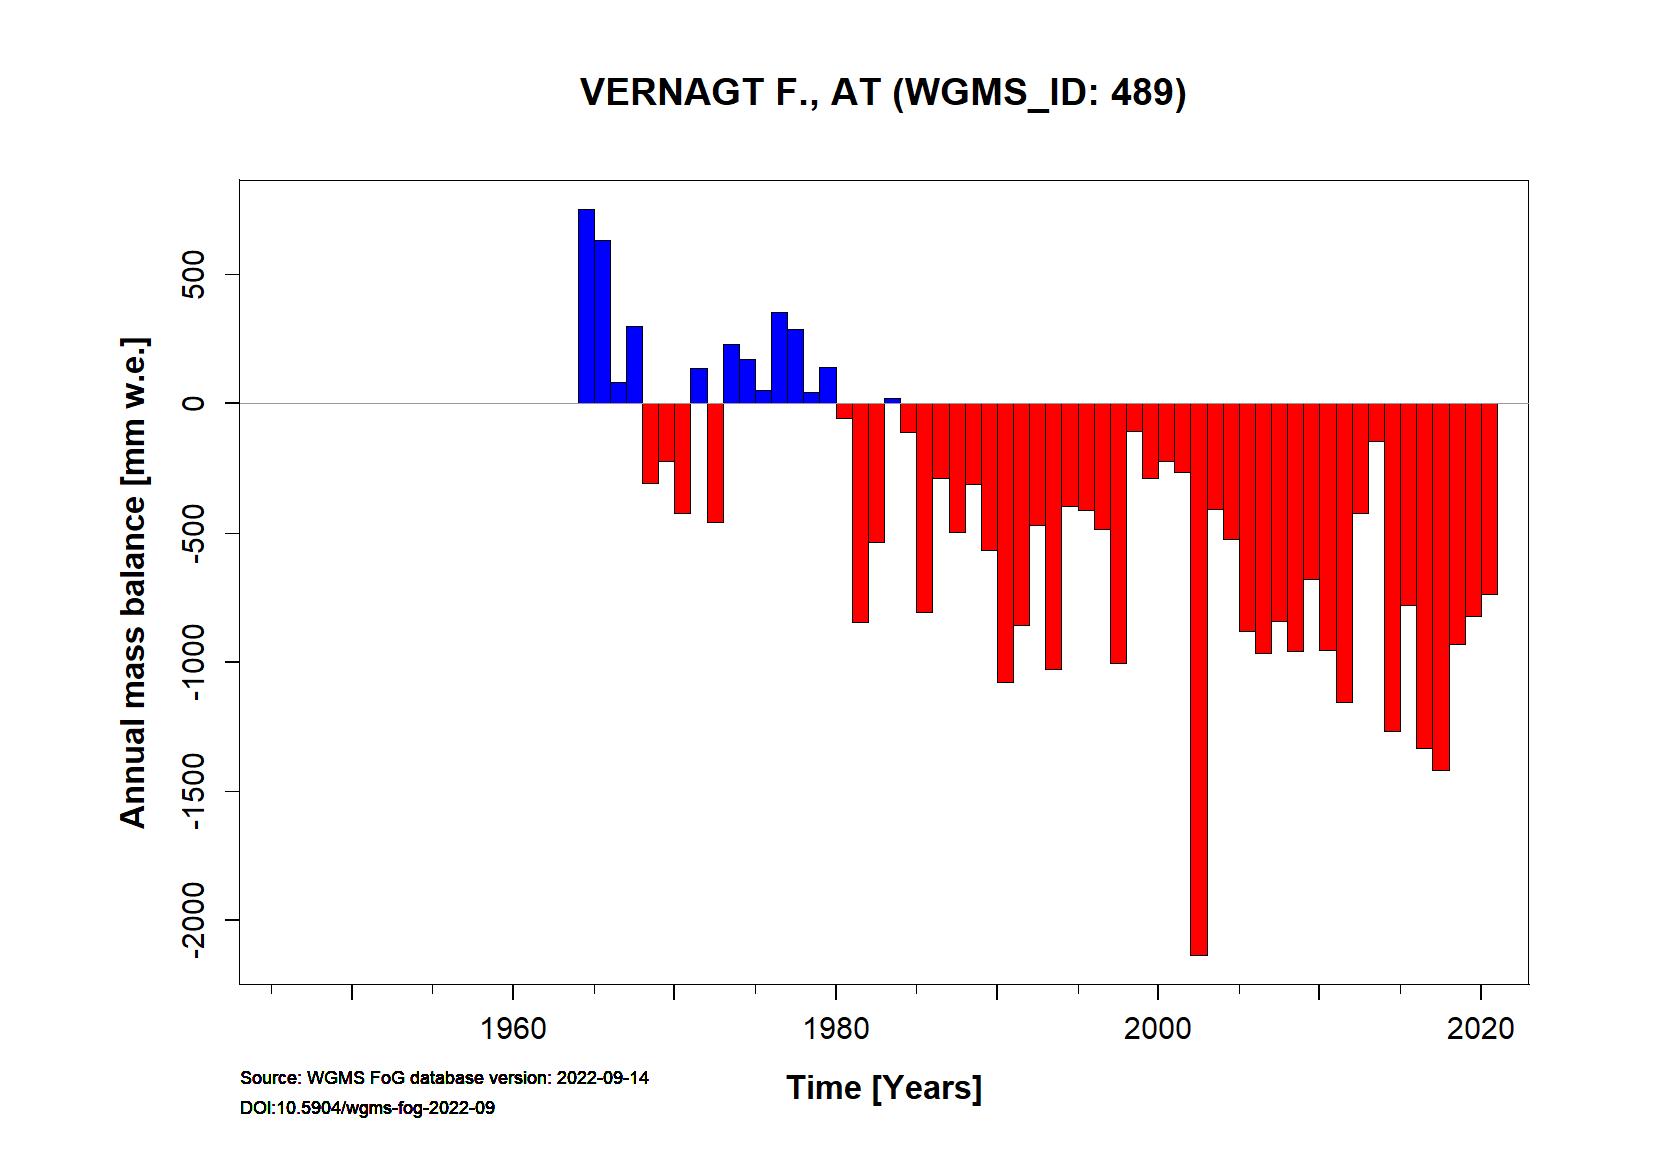 Vernagtferner Annual Mass Balance (WGMS, 2015)